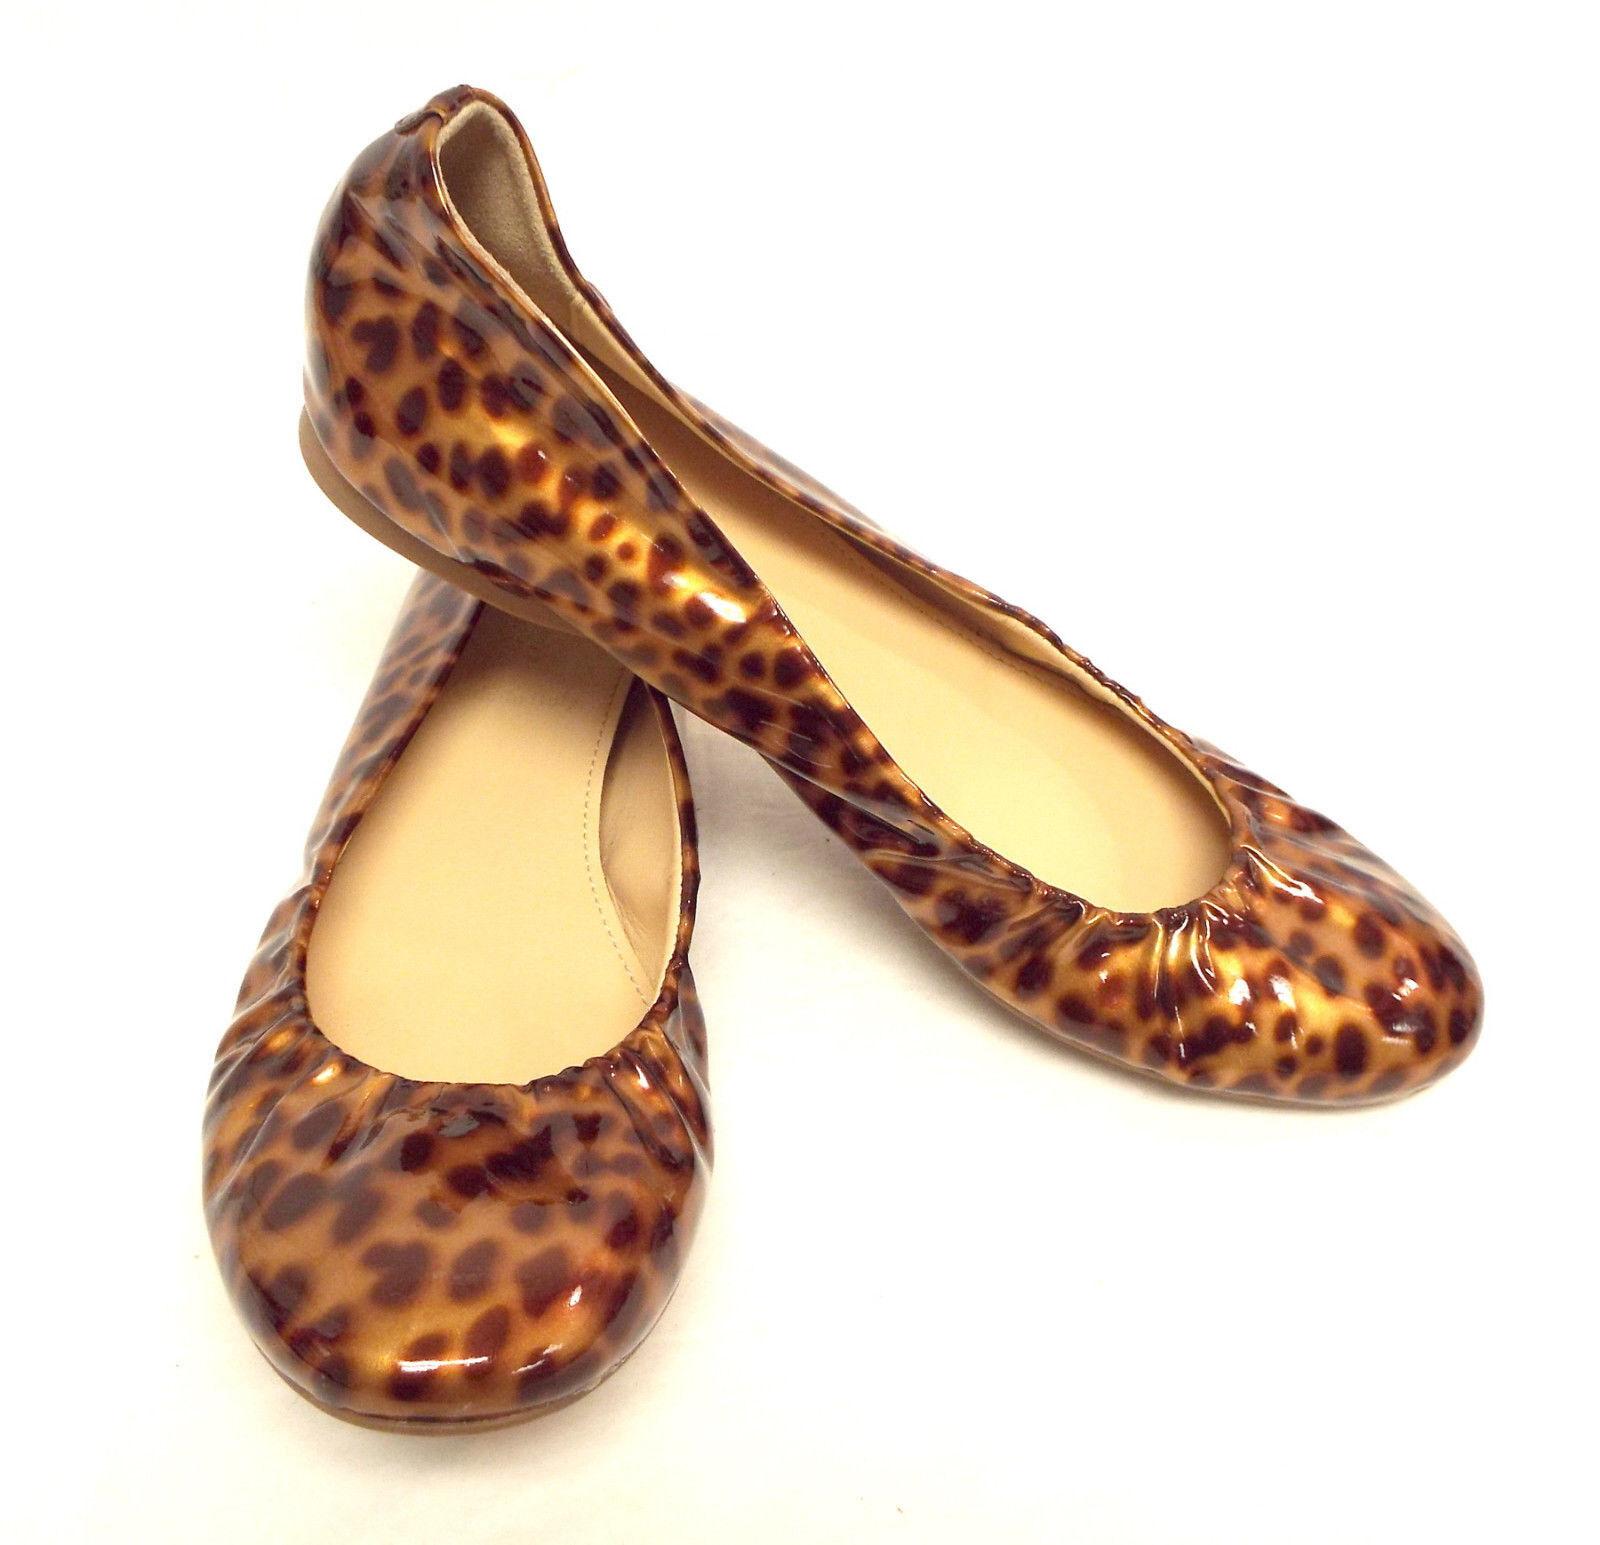 J. Crew Talla 5.5 5.5 5.5 patente Leopardo Ballet Zapatos sin Taco 5 1 2  caliente